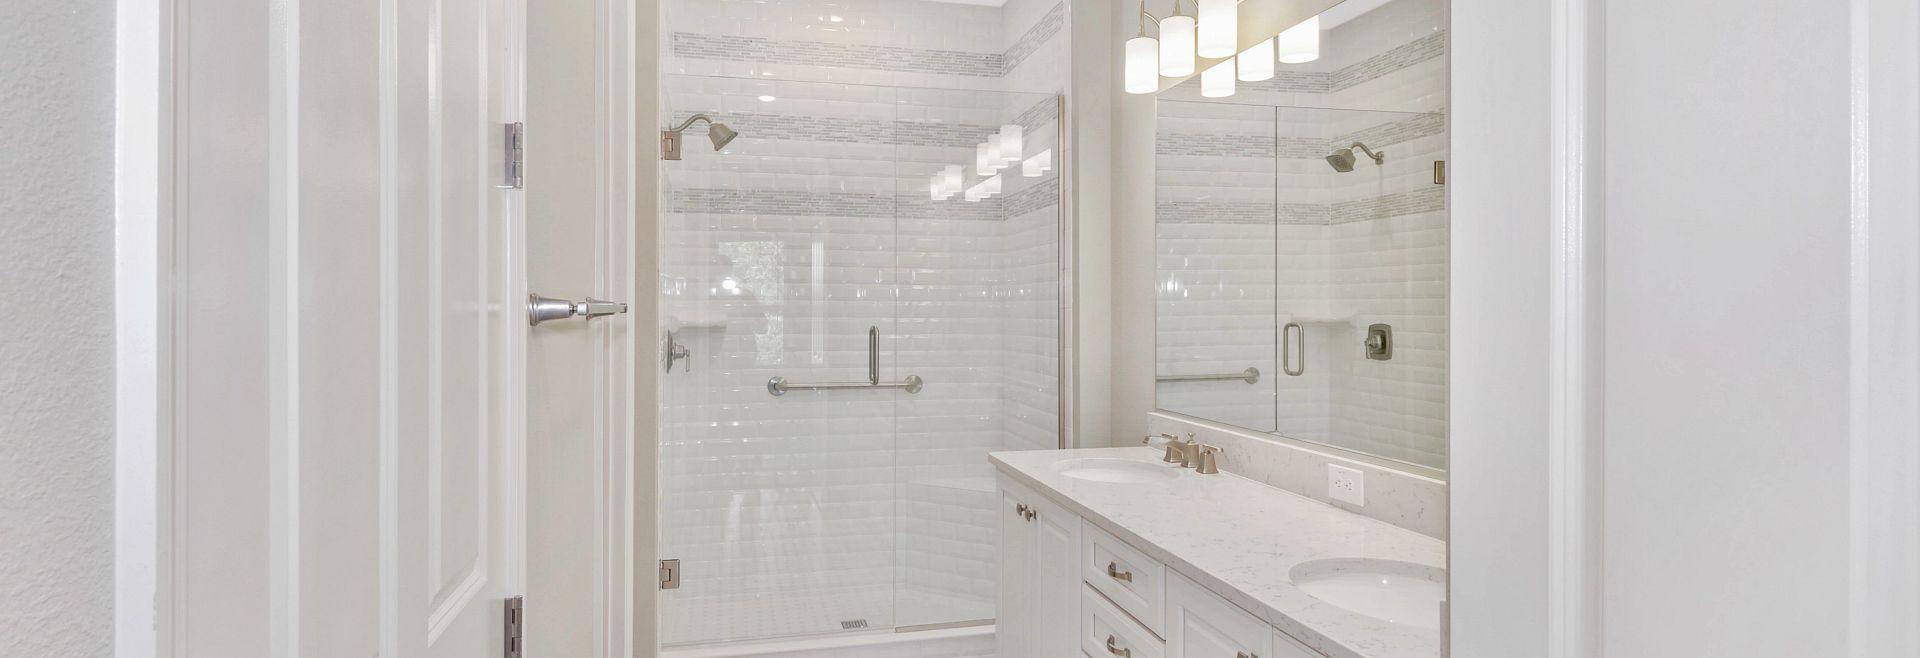 Trilogy at Ocala Preserve Quick Move In Home Liberty HS 163 Master Bath